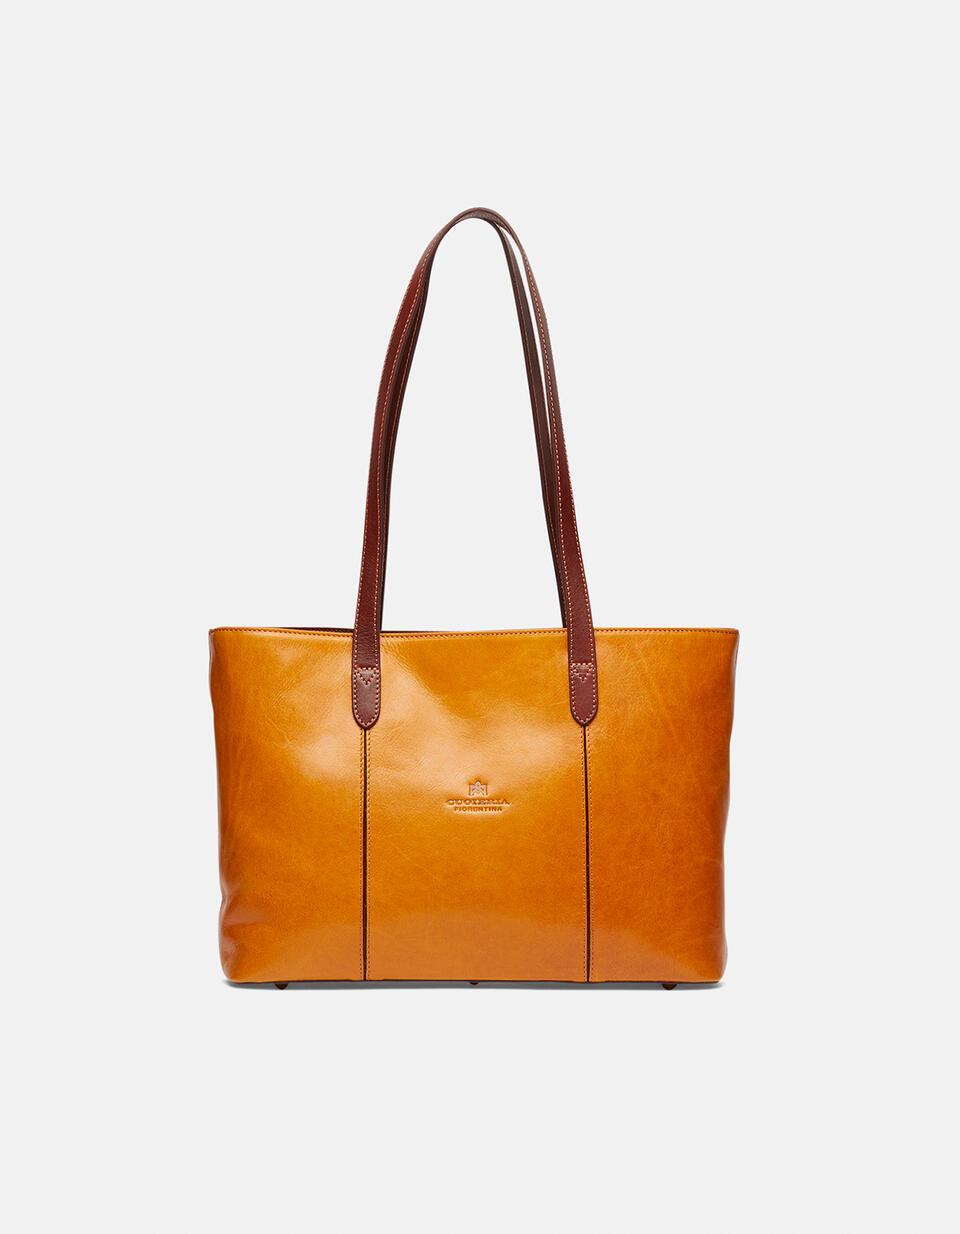 Warm and Colour large leather shopping bag GIALLOBICOLORE Cuoieria Fiorentina